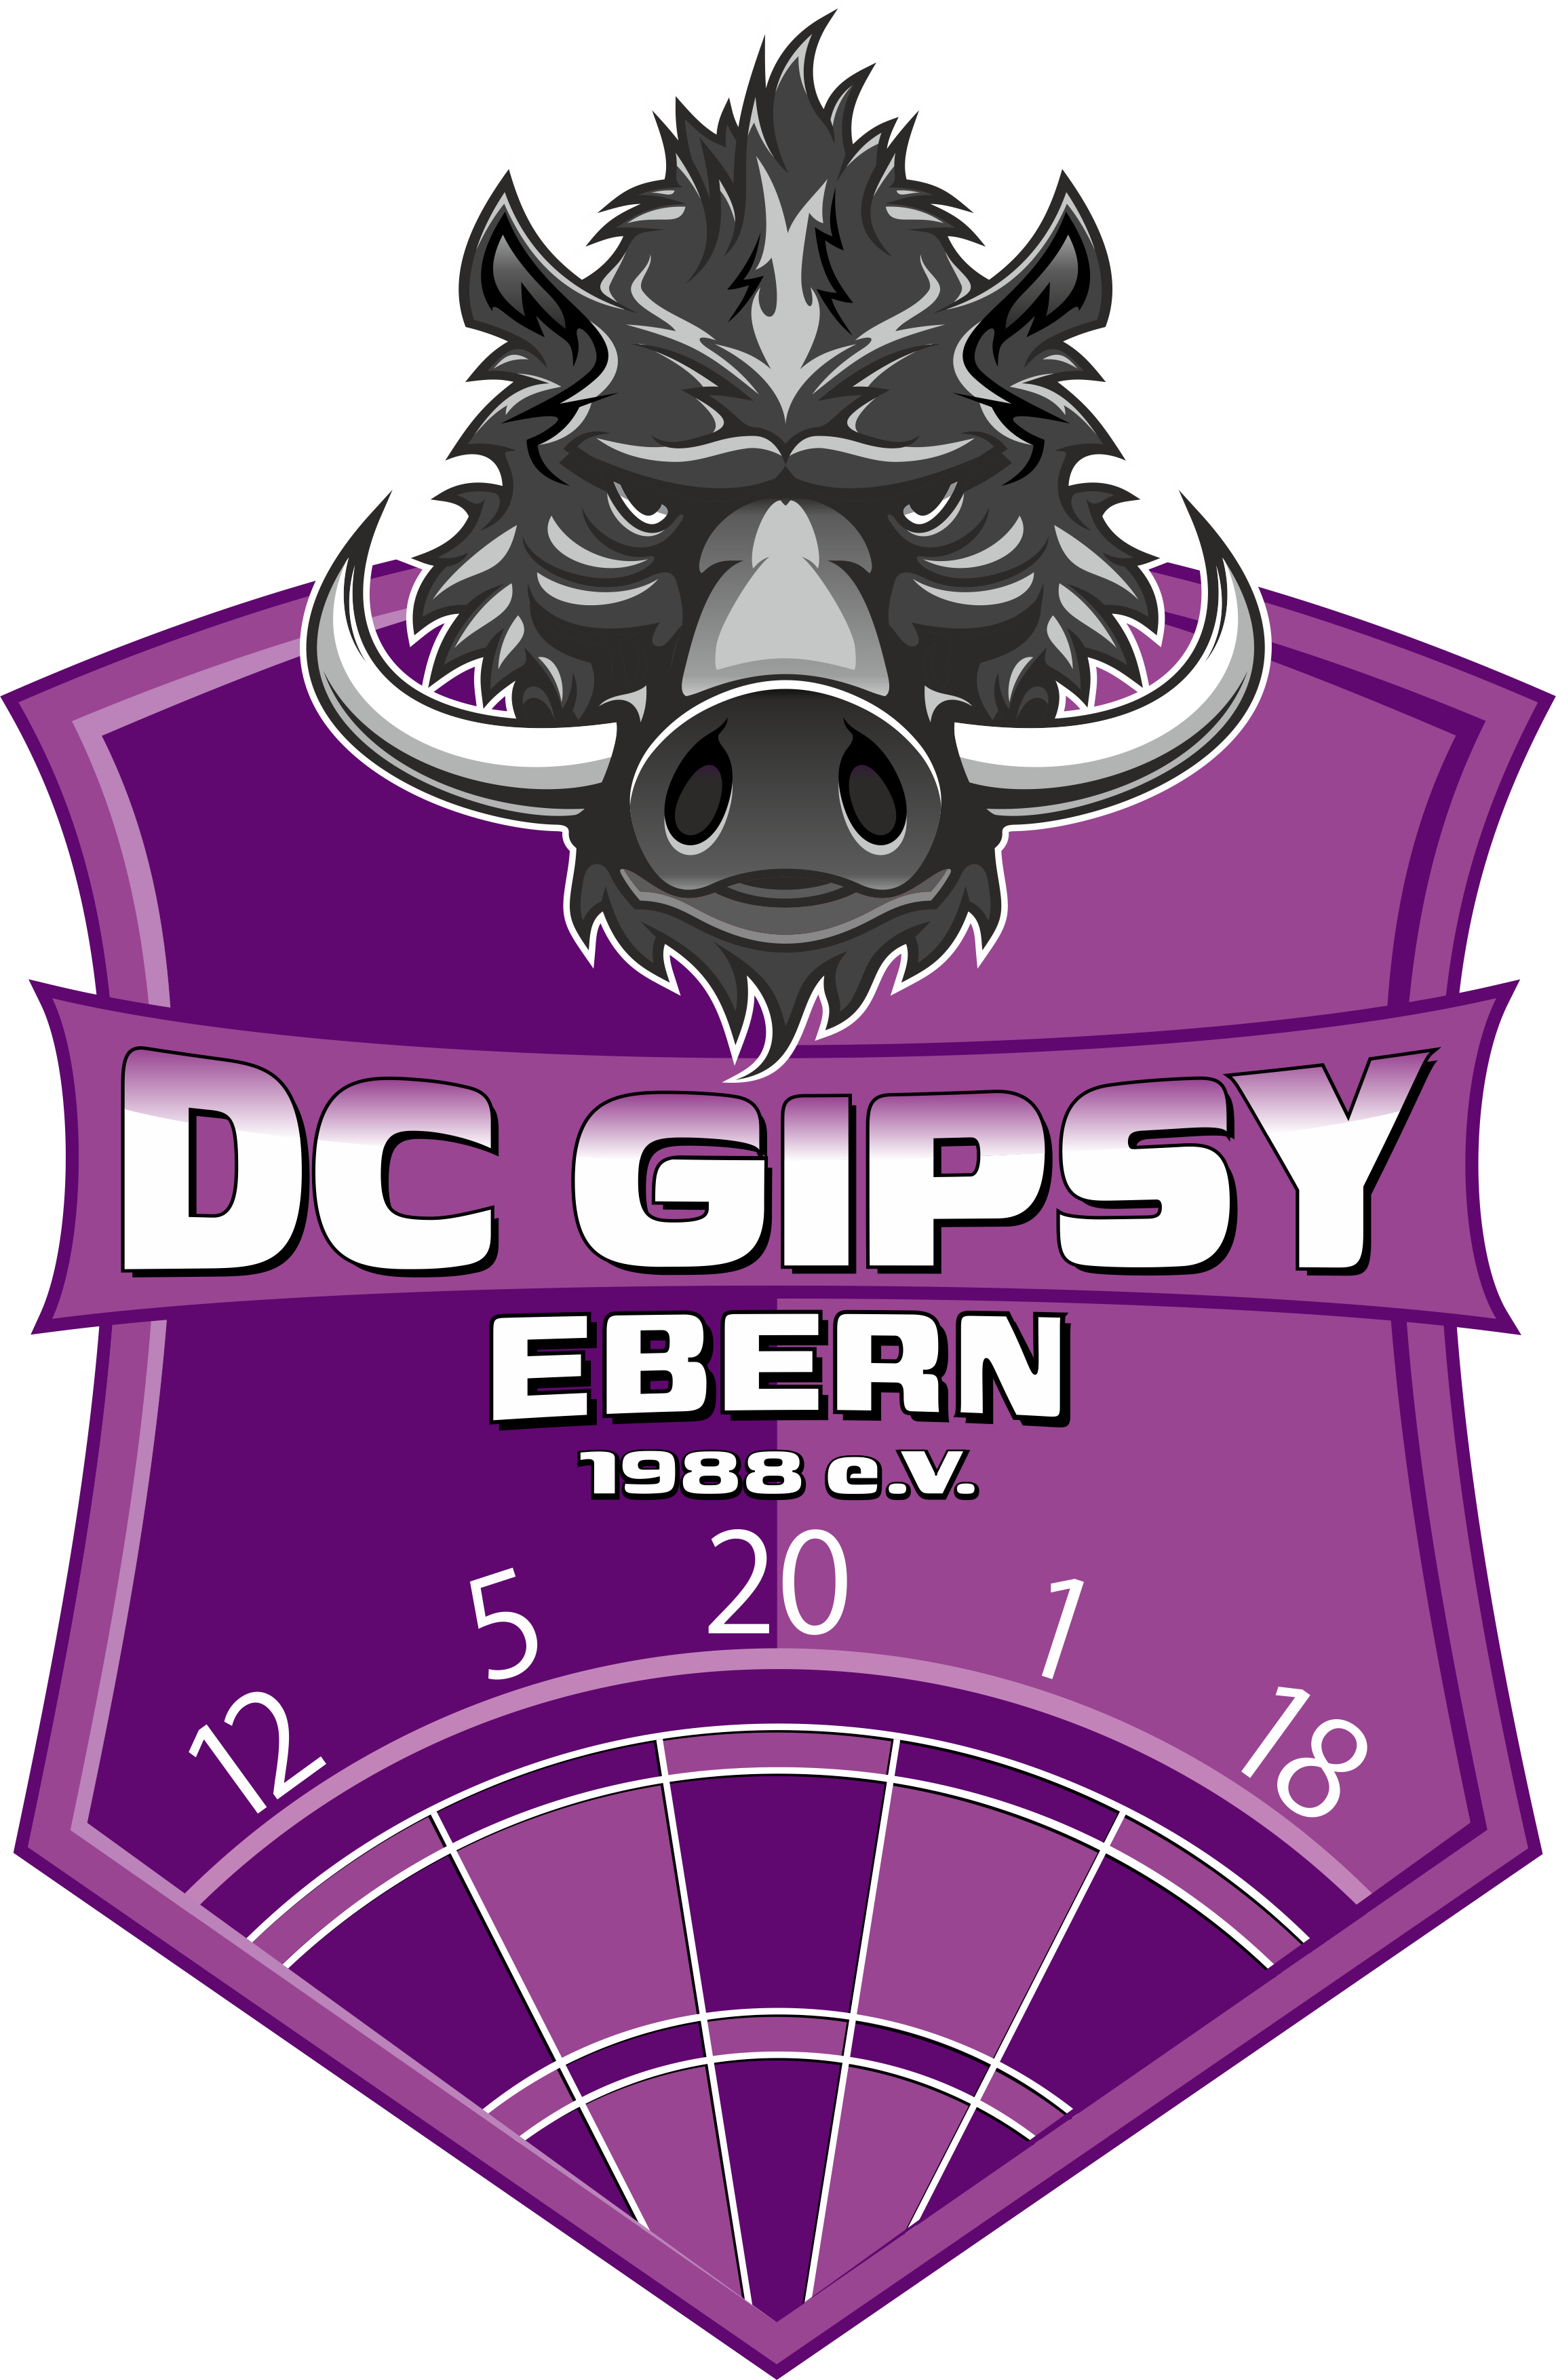 DC Gipsy Ebern 1988 e.V.